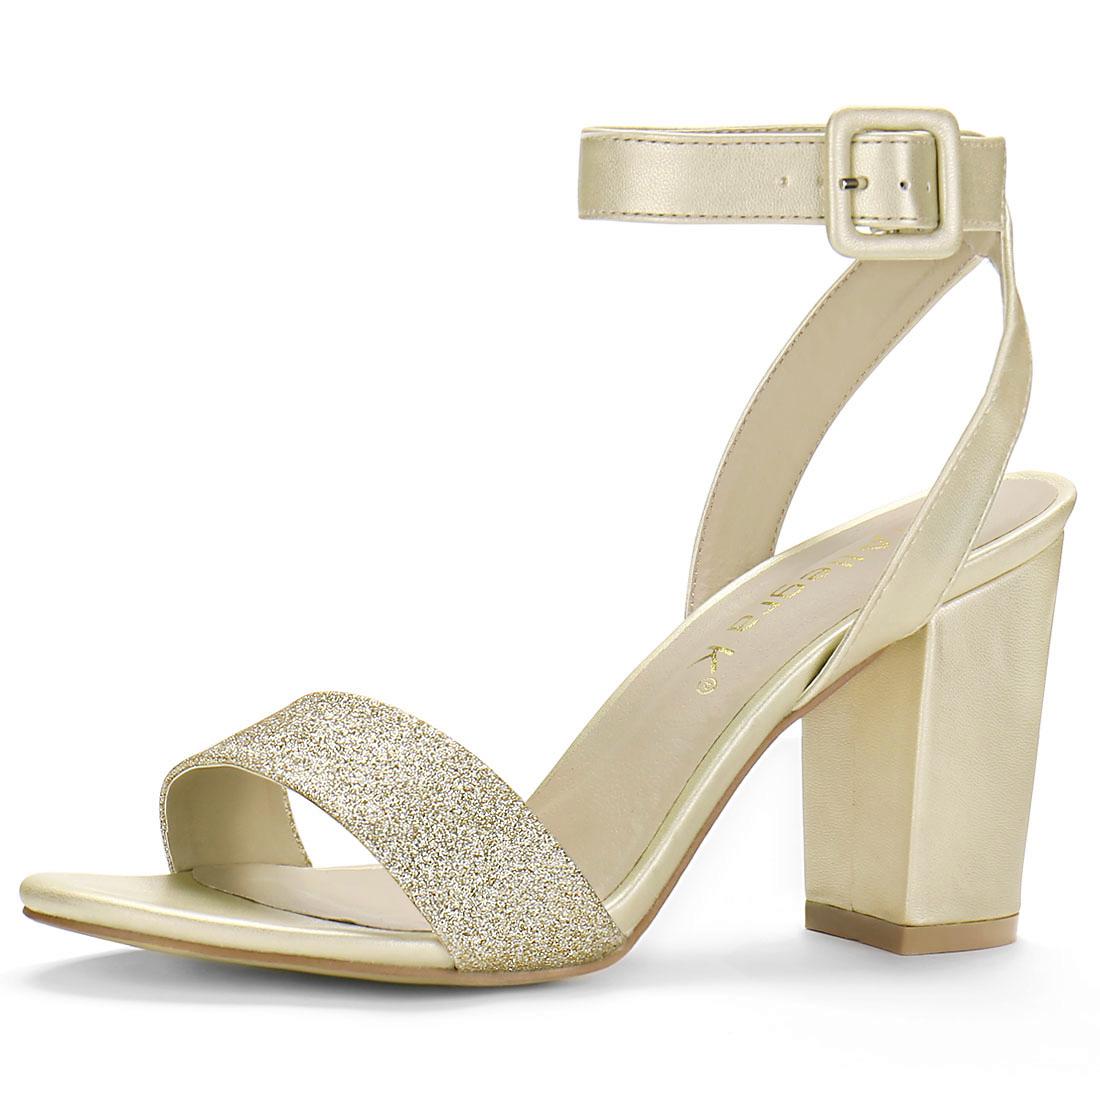 Women's Slingback Ankle Strap High Heels Sandals Gold-2 US 7.5